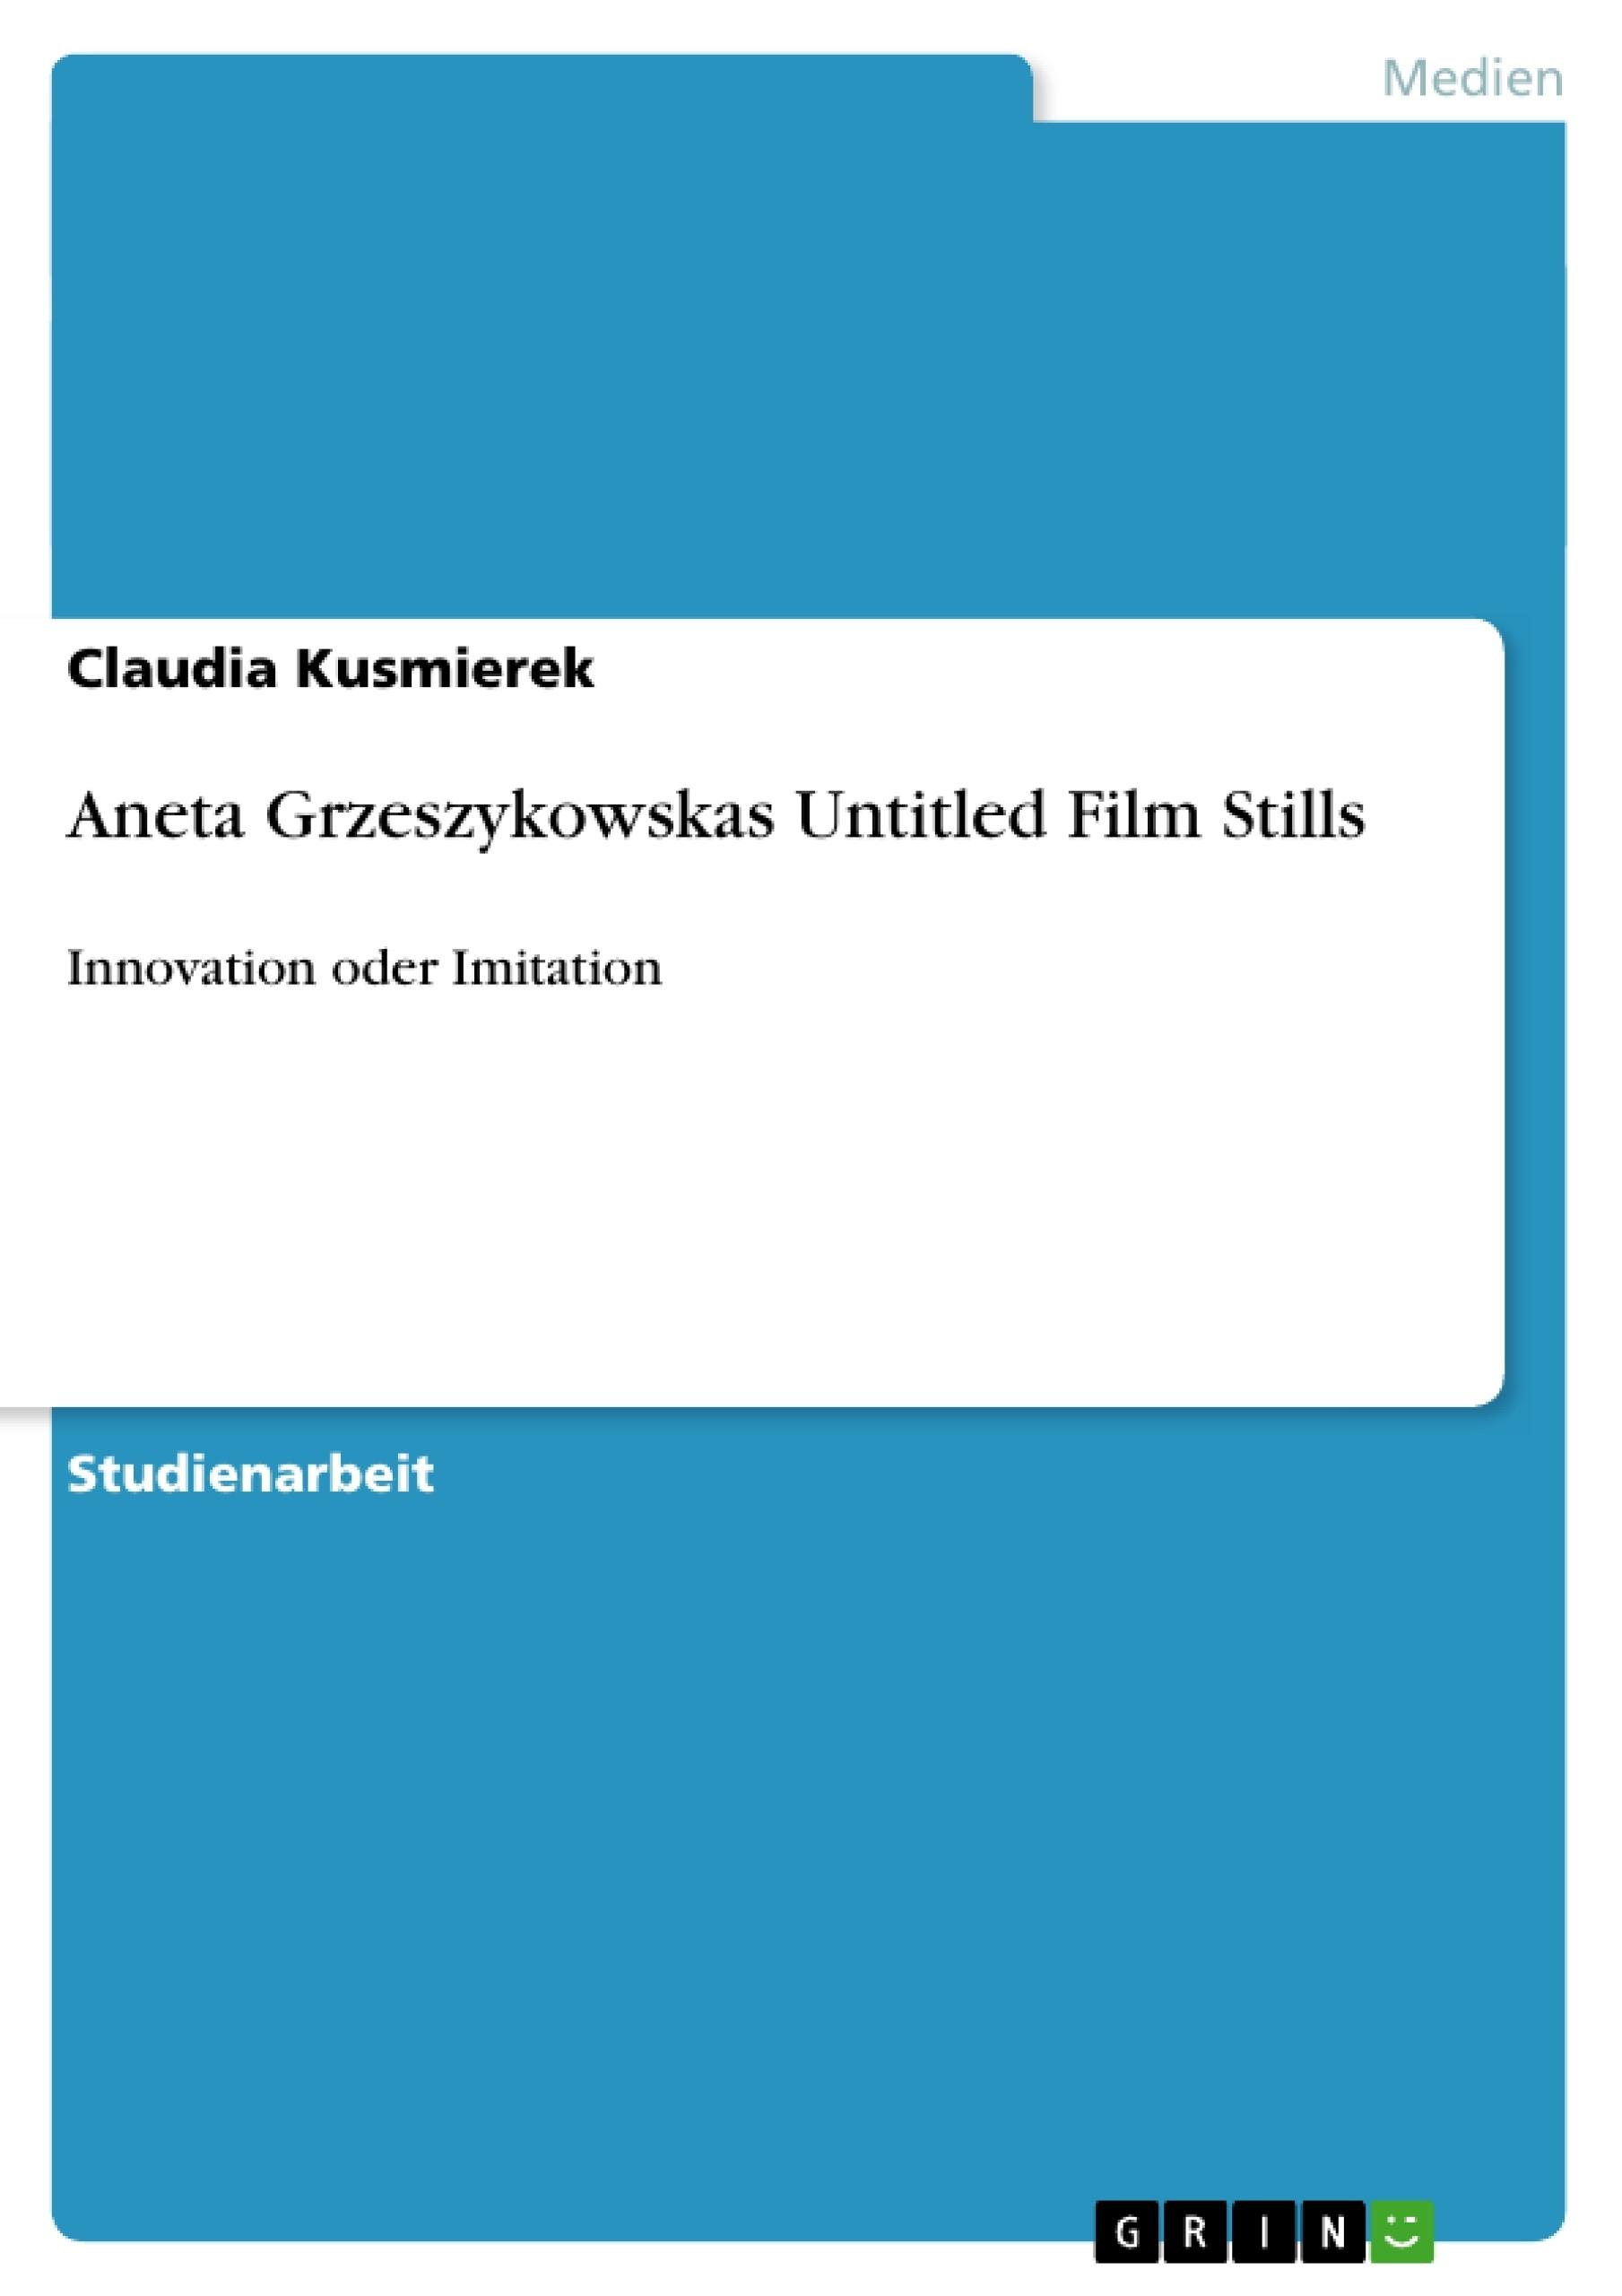 Titel: Aneta Grzeszykowskas Untitled Film Stills